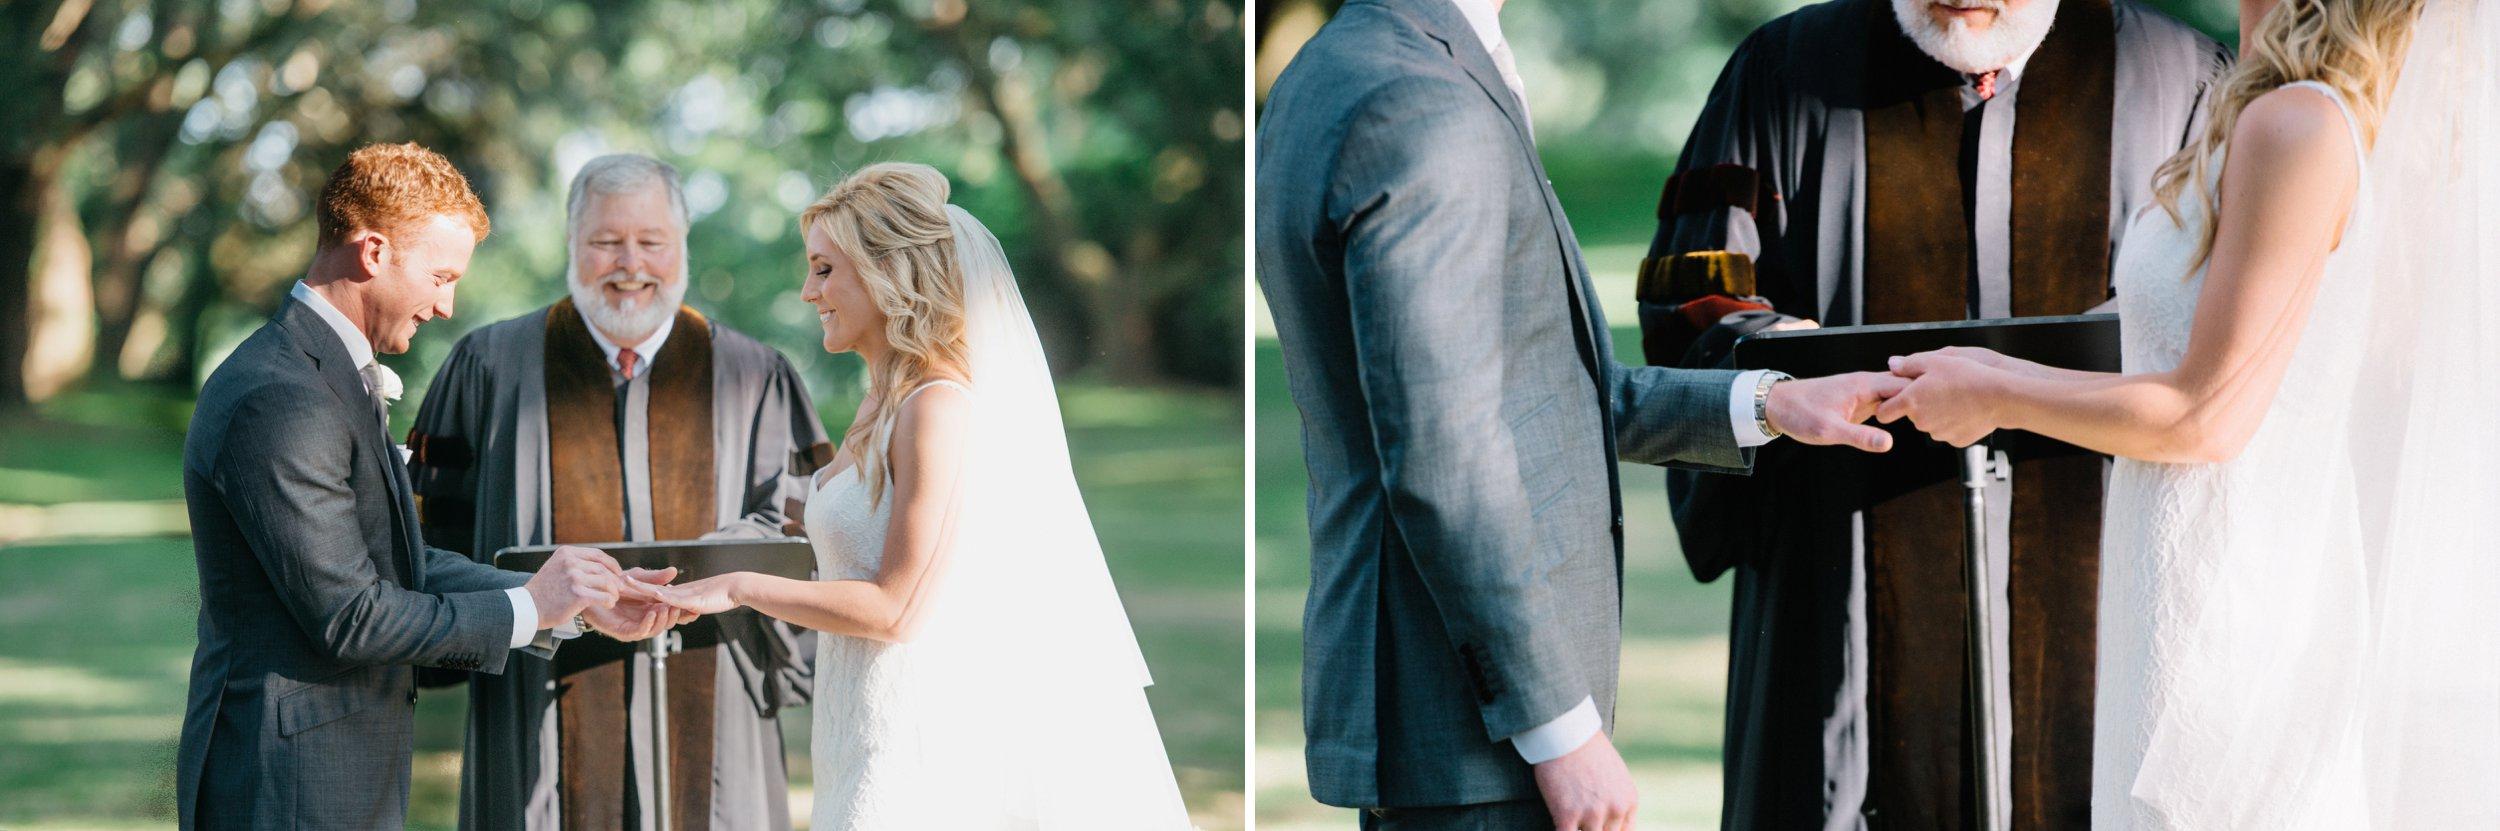 legare-waring-house-wedding-32.jpg